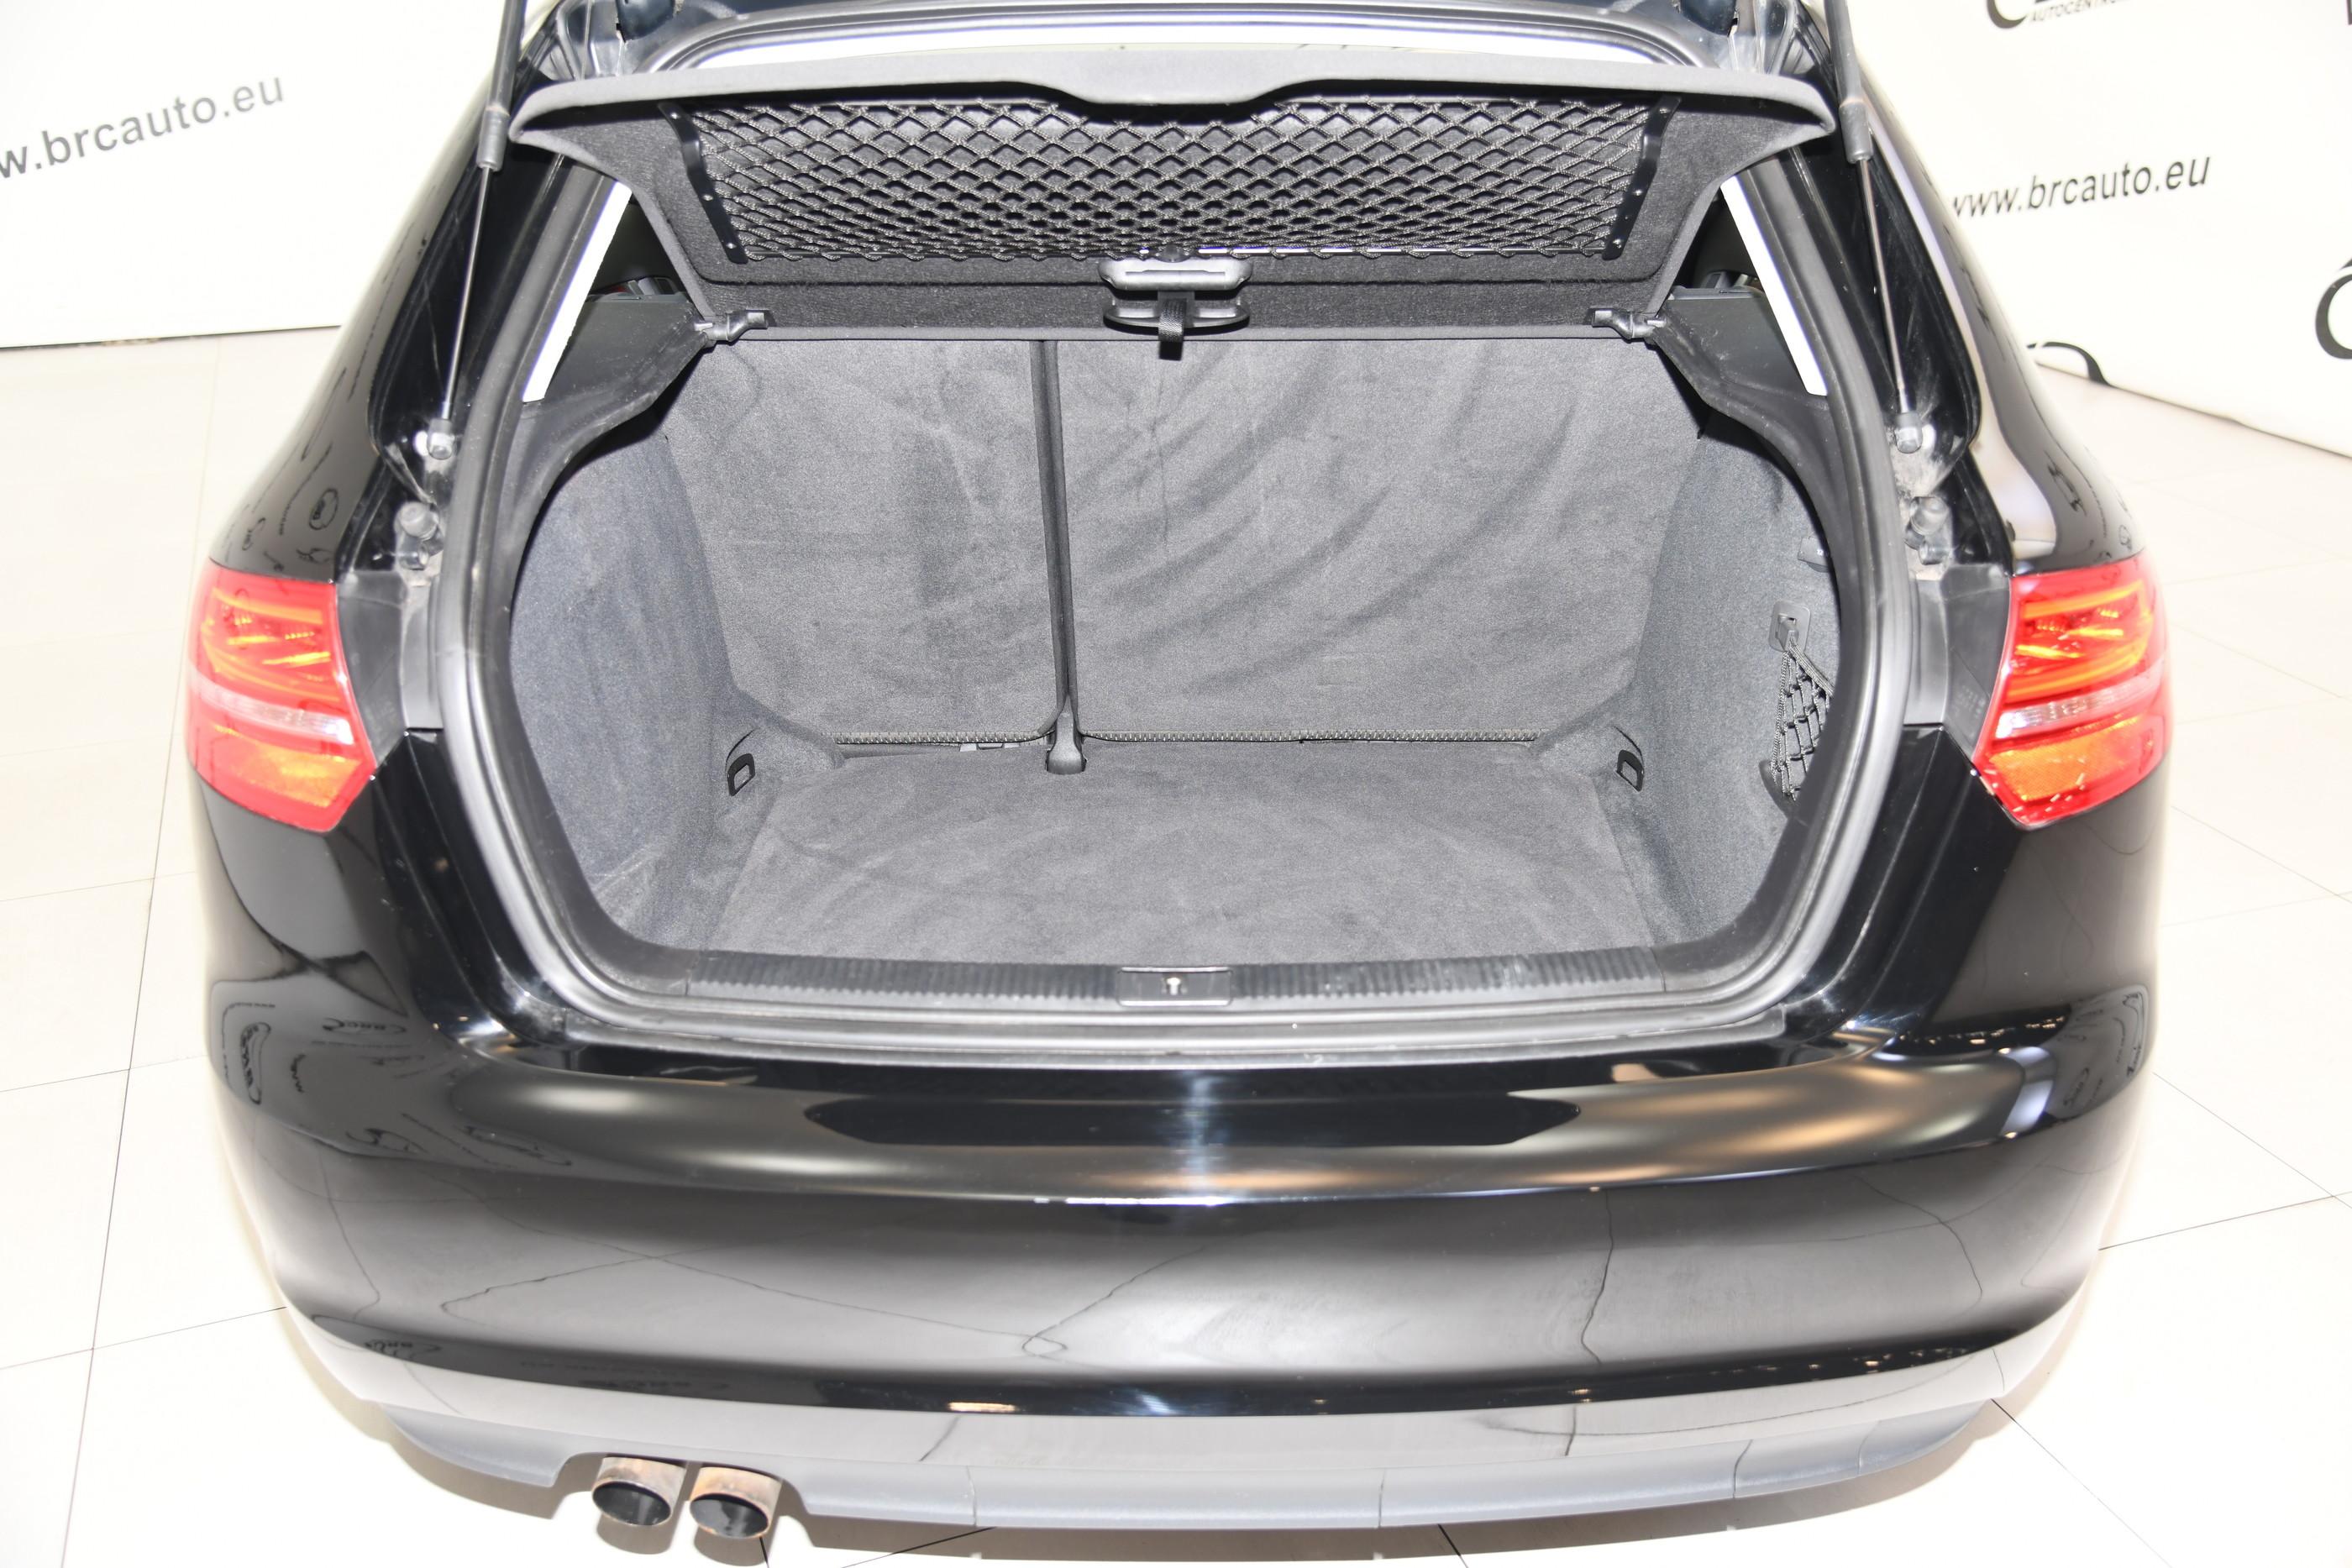 Audi A3 1.8 TFSI Sportback Automatas